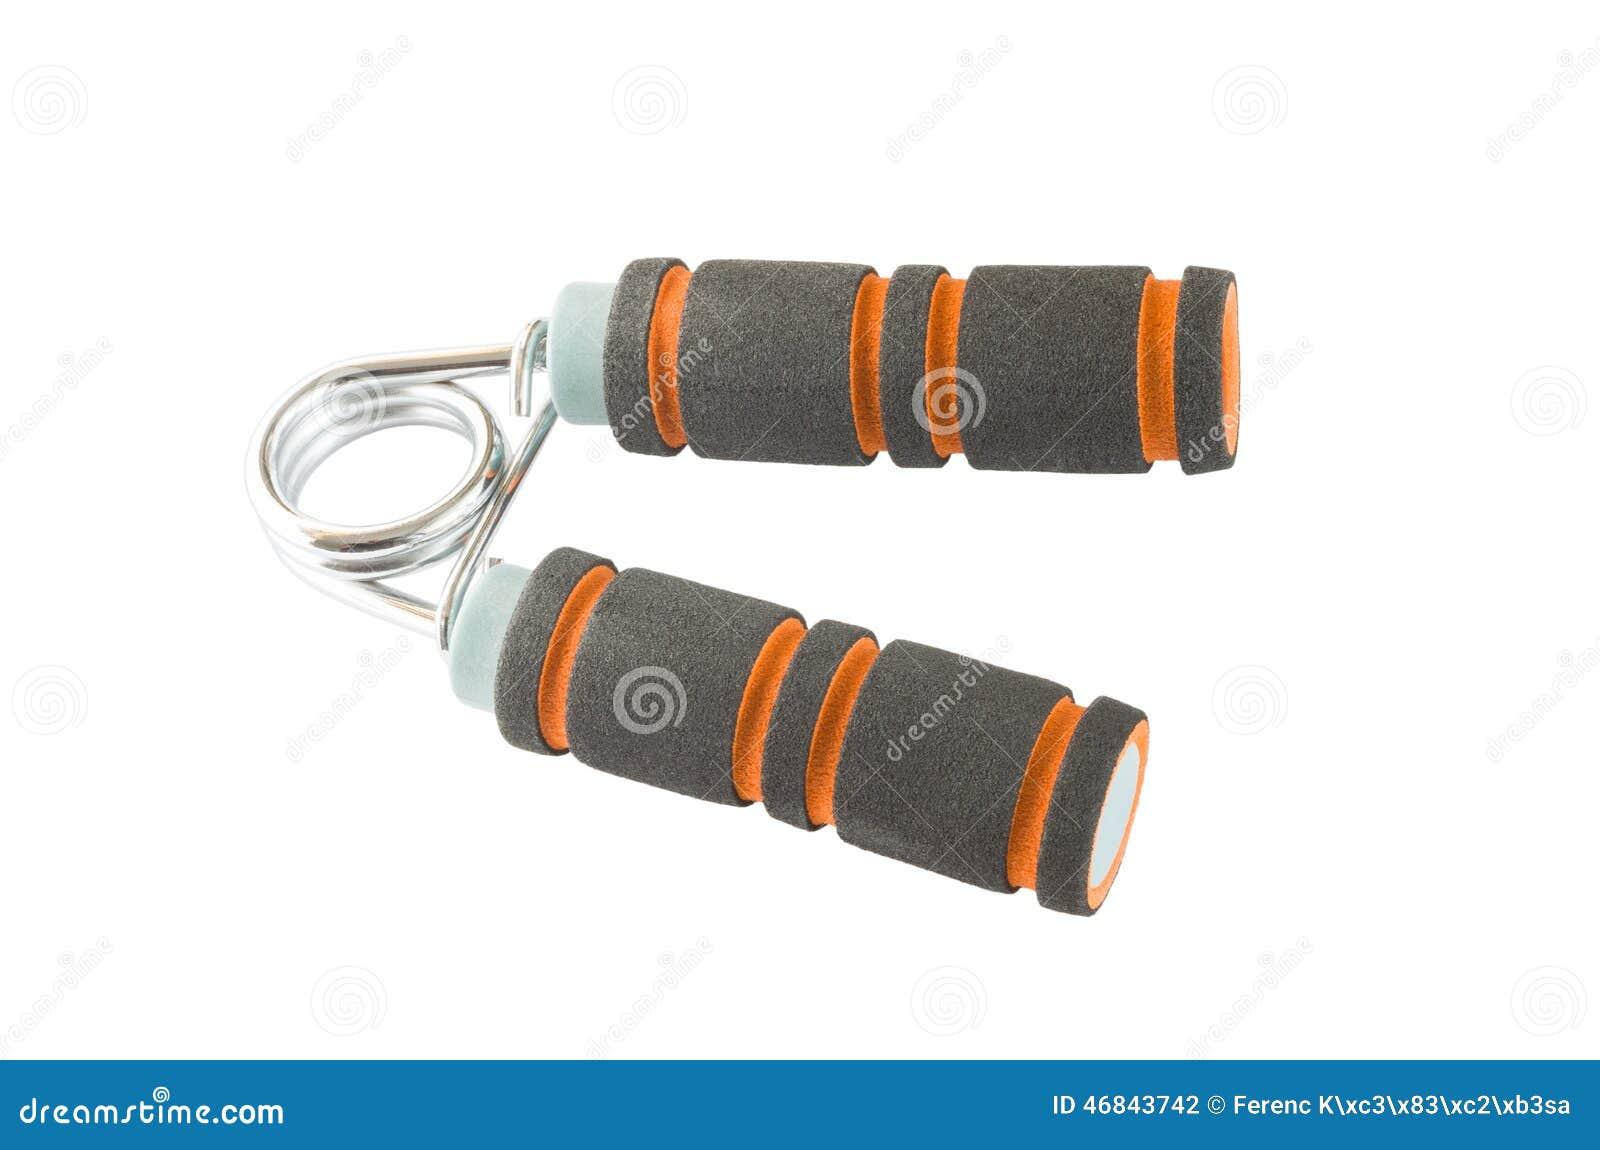 Wrist Exercise Equipment Stock Photo - Image: 46843742